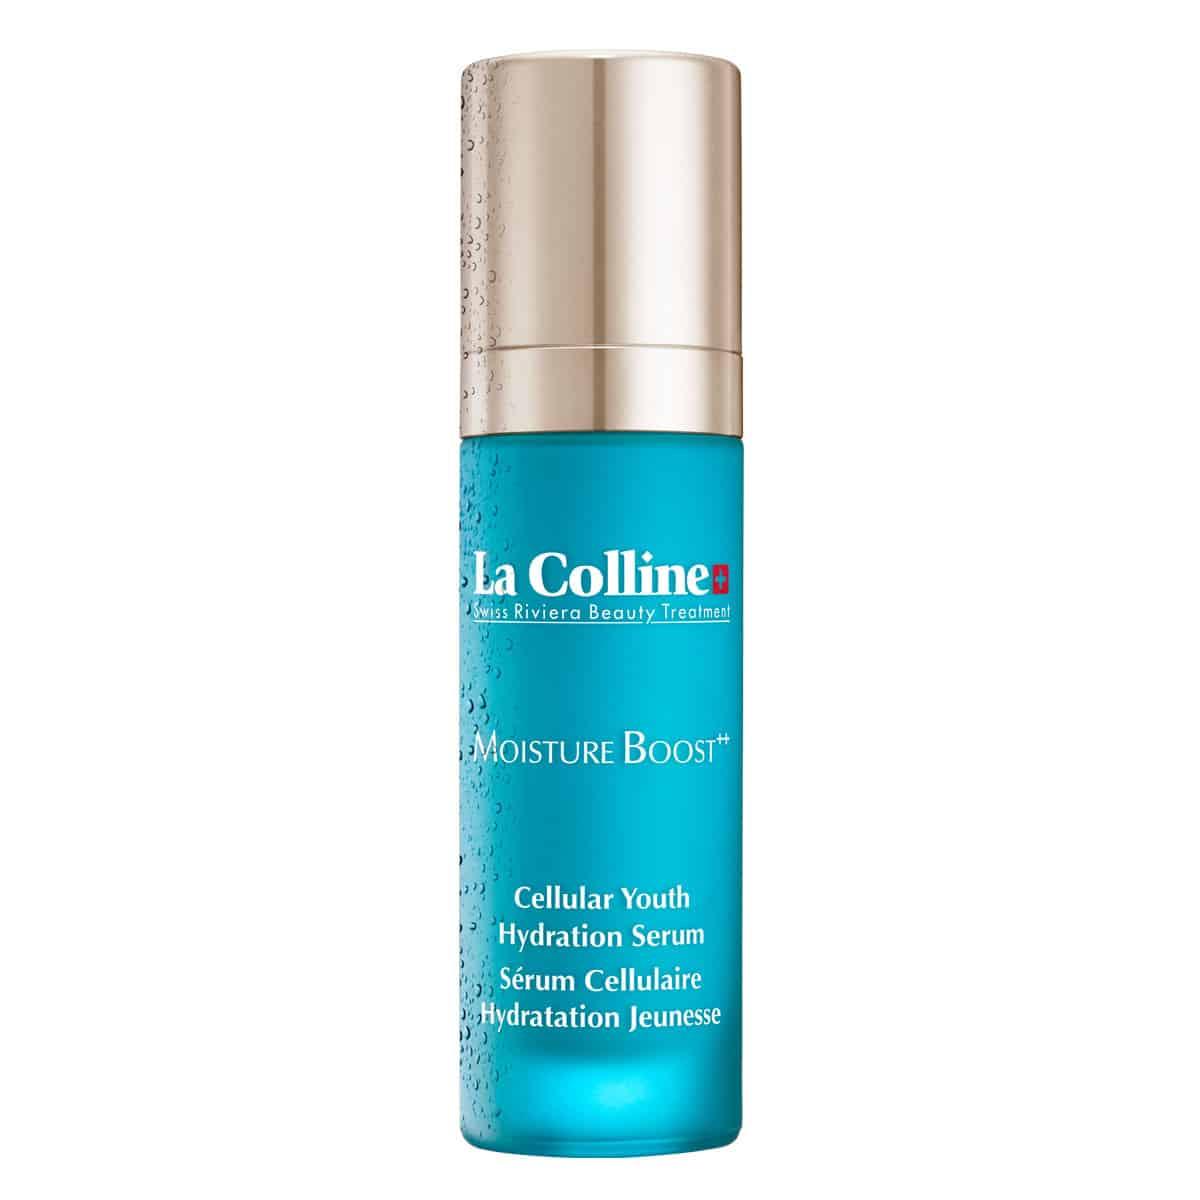 La Colline Cellular Youth Hydration Serum